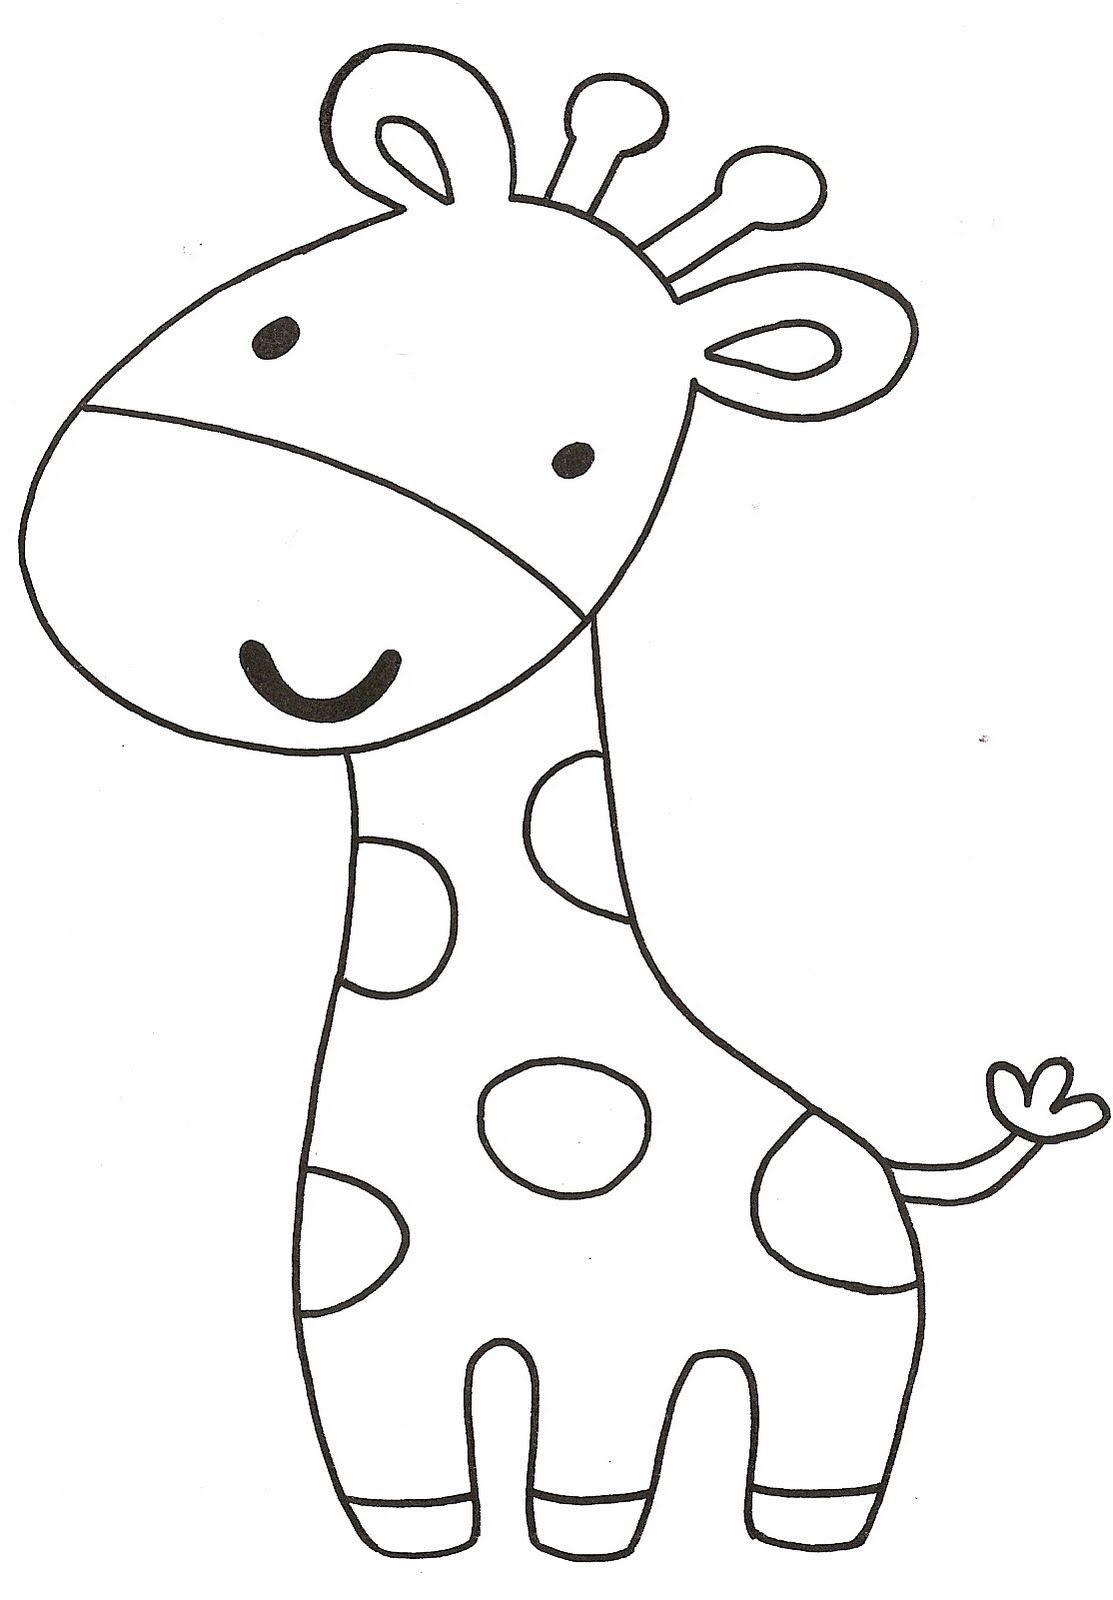 Giraffe template printable pattern coloringpage Moldes de